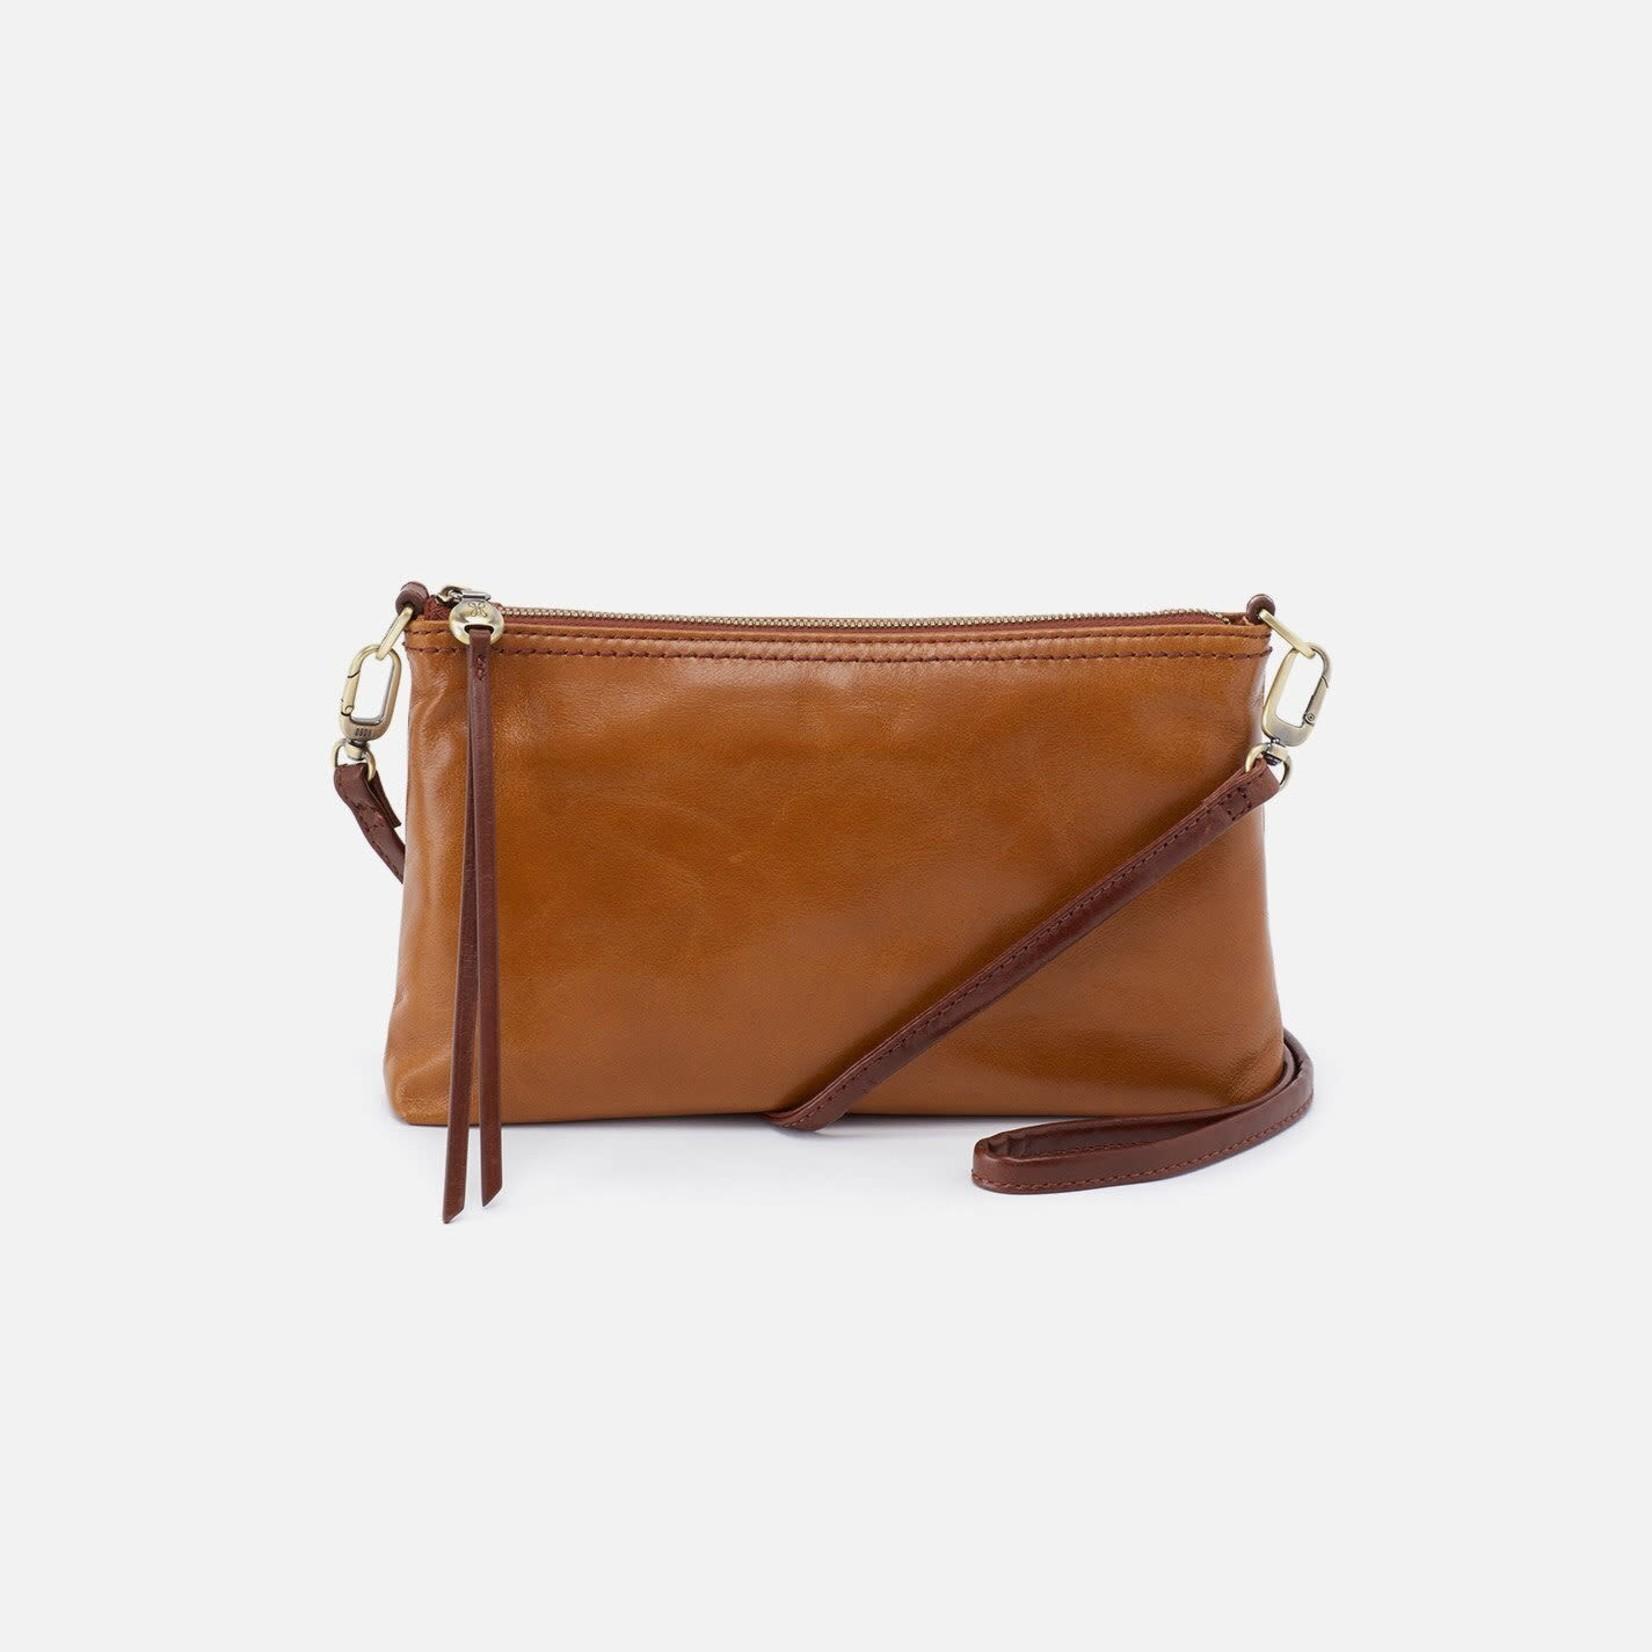 HOBO Darcy Truffle Vintage Hide Leather Wristlet/Crossbody